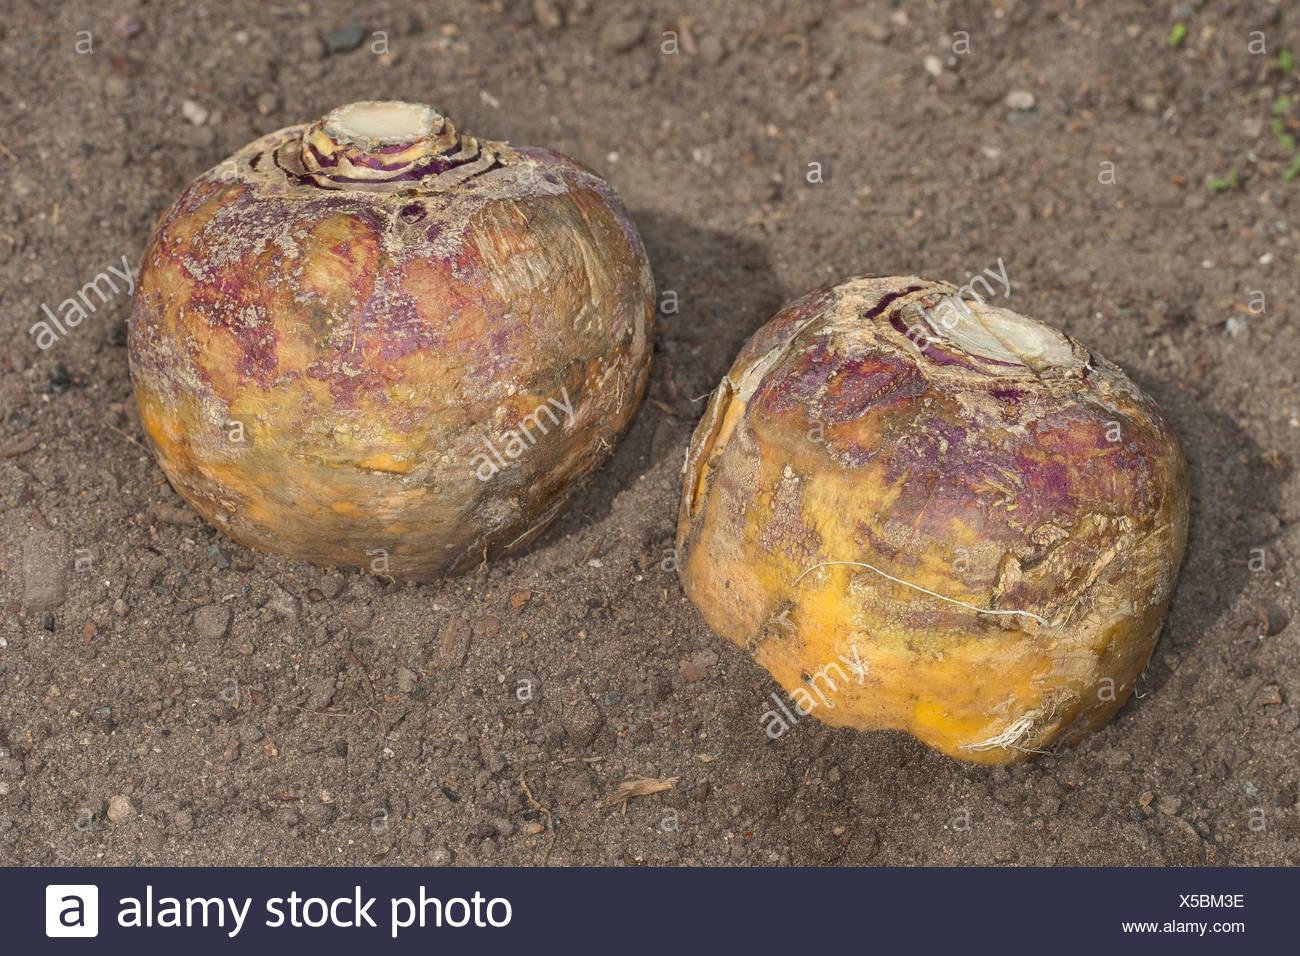 rutabaga, swede, turnip, yellow turnip, neep, root, beet (Brassica napus subsp. rapifera, Brassica napus rapifera, Brassica rapifera), two harvested rutabagas, Germany - Stock Image